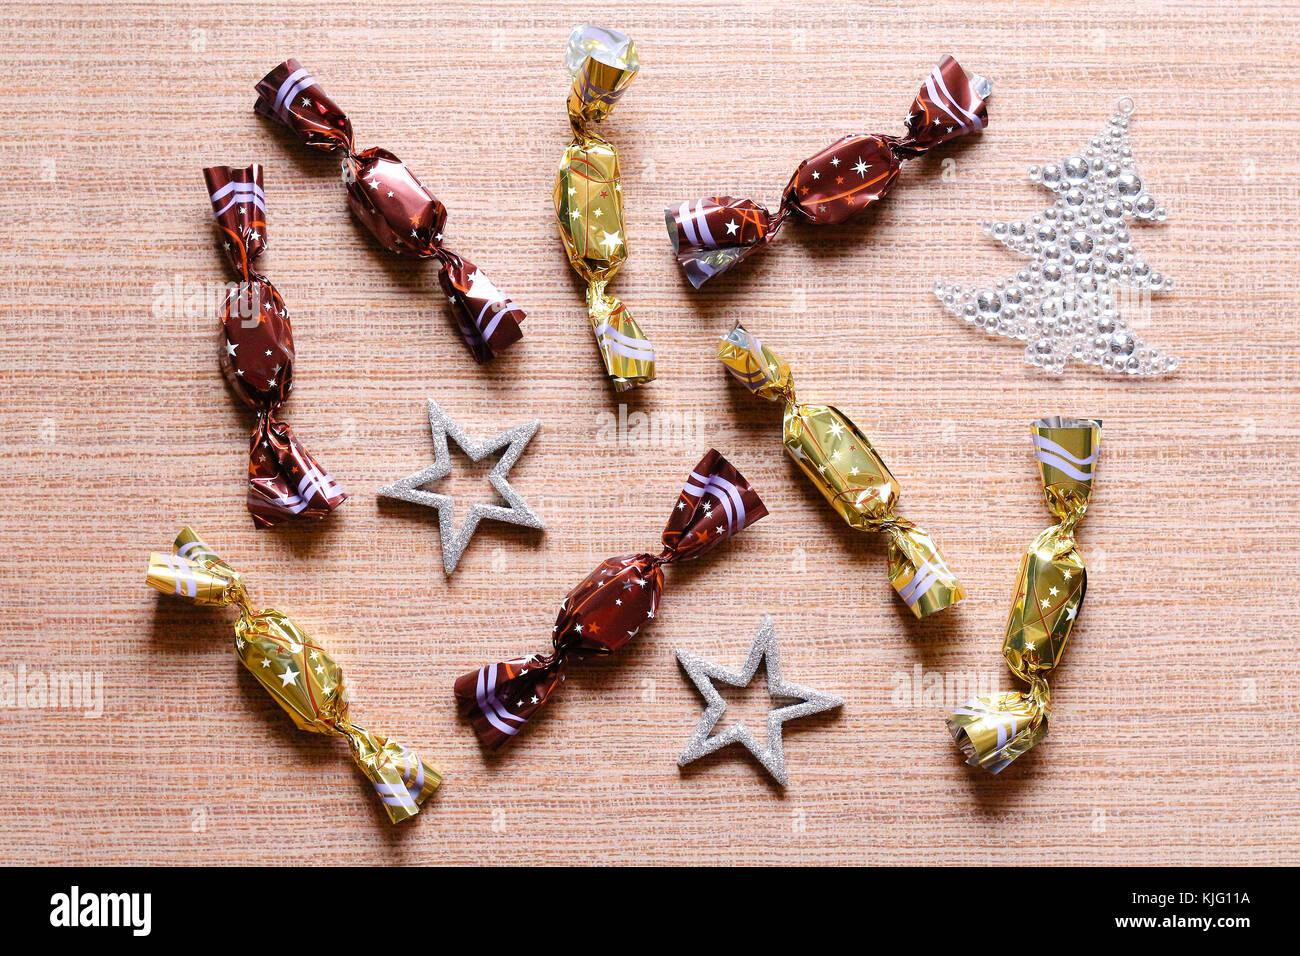 Hungarian Christmas Traditions.Hungarian Christmas Traditions Stock Photos Hungarian